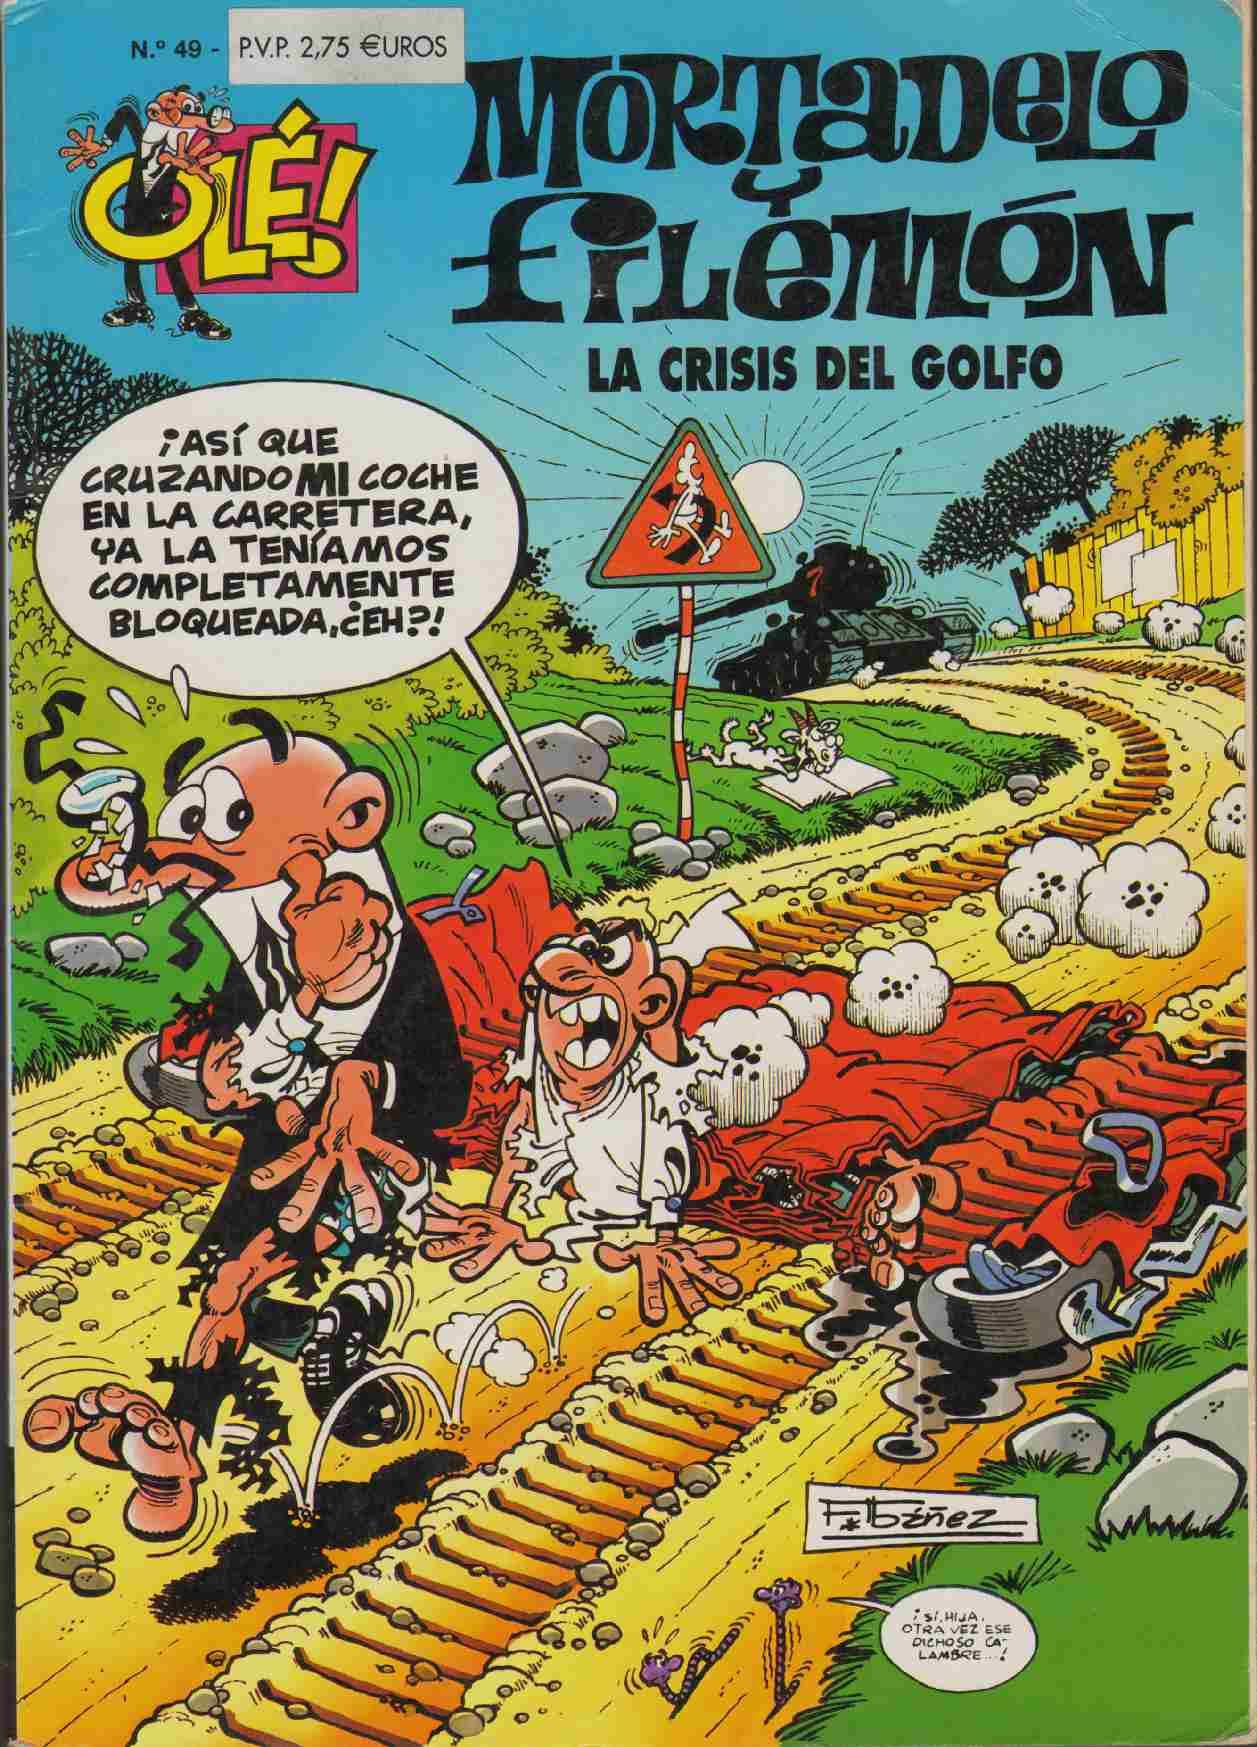 OLE MORTADELO Y FILEMON Nº 49 CRISIS DEL GOLFO